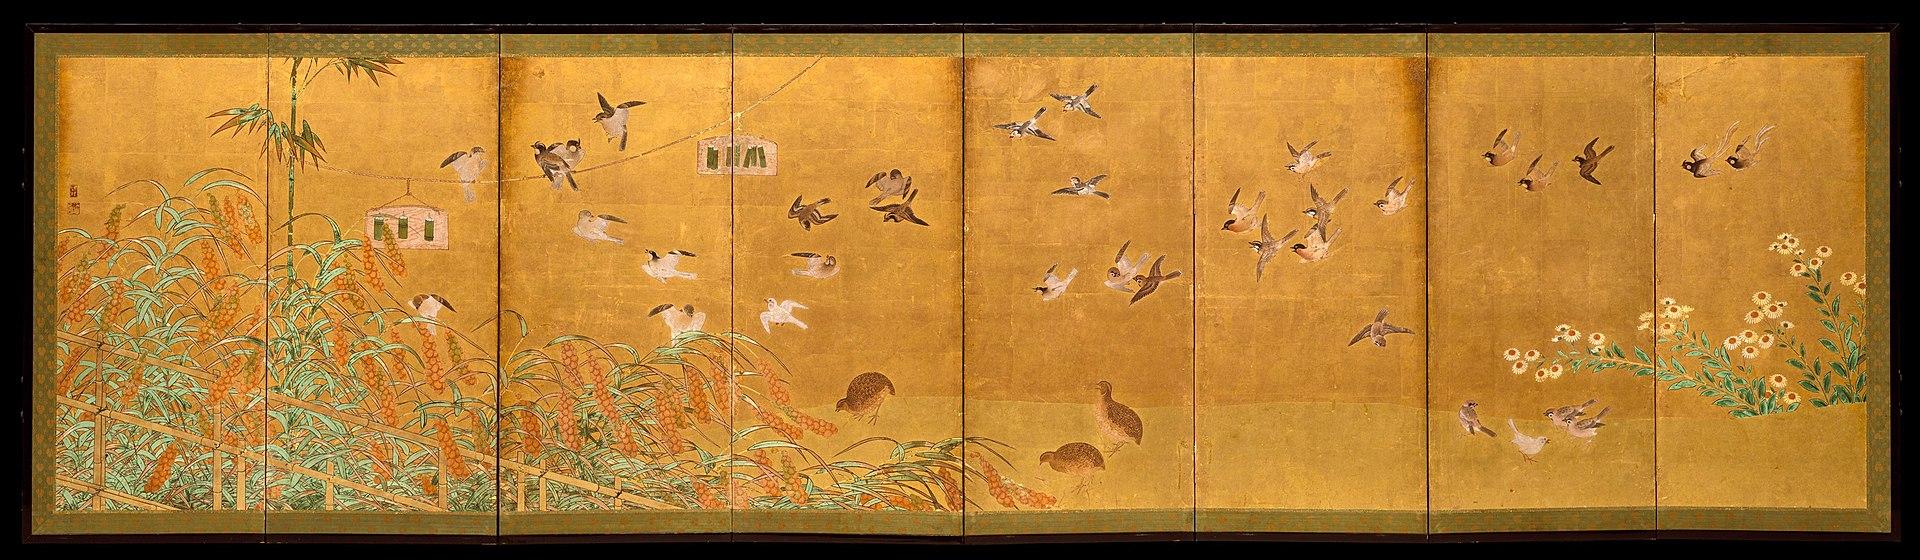 1920px-伝狩野山楽筆_粟に小禽図屏風-Autumn_Millet_and_Small_Birds_MET_DT1590.jpg